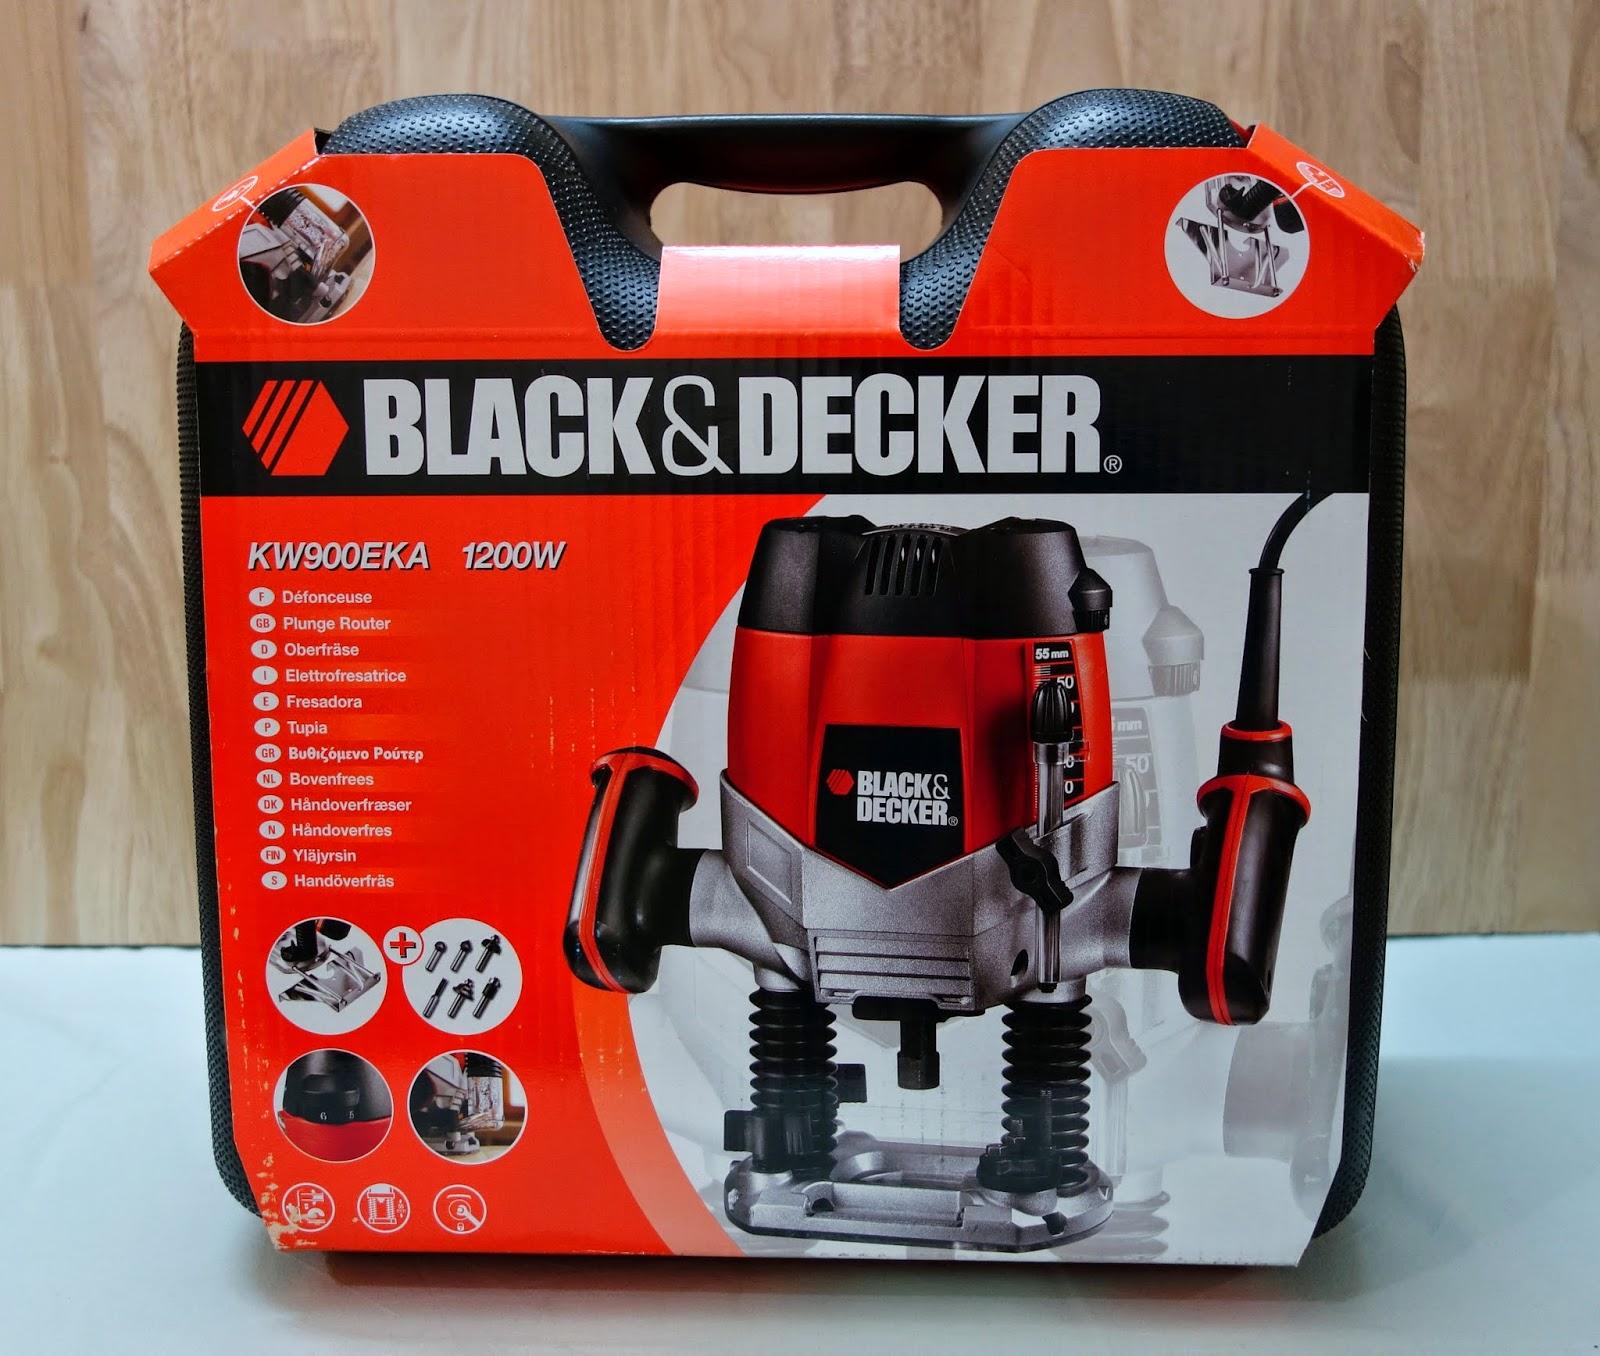 Black & Decker KW900EKA Review | Do The DIY